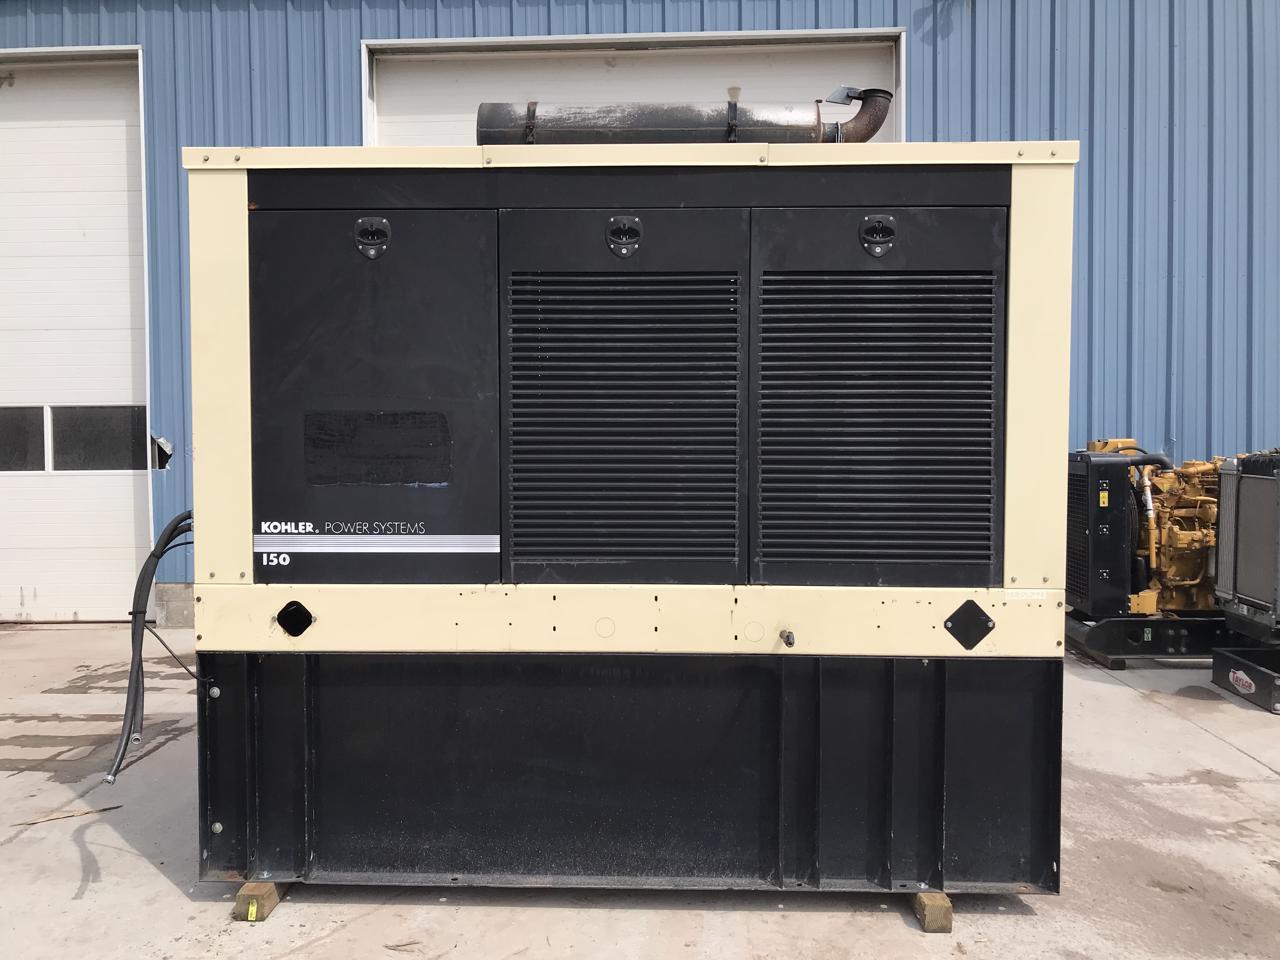 _160 kW Kohler Generator Set, 12 Lead, 336 Gallon Base Fuel Tank, Weather  Proof